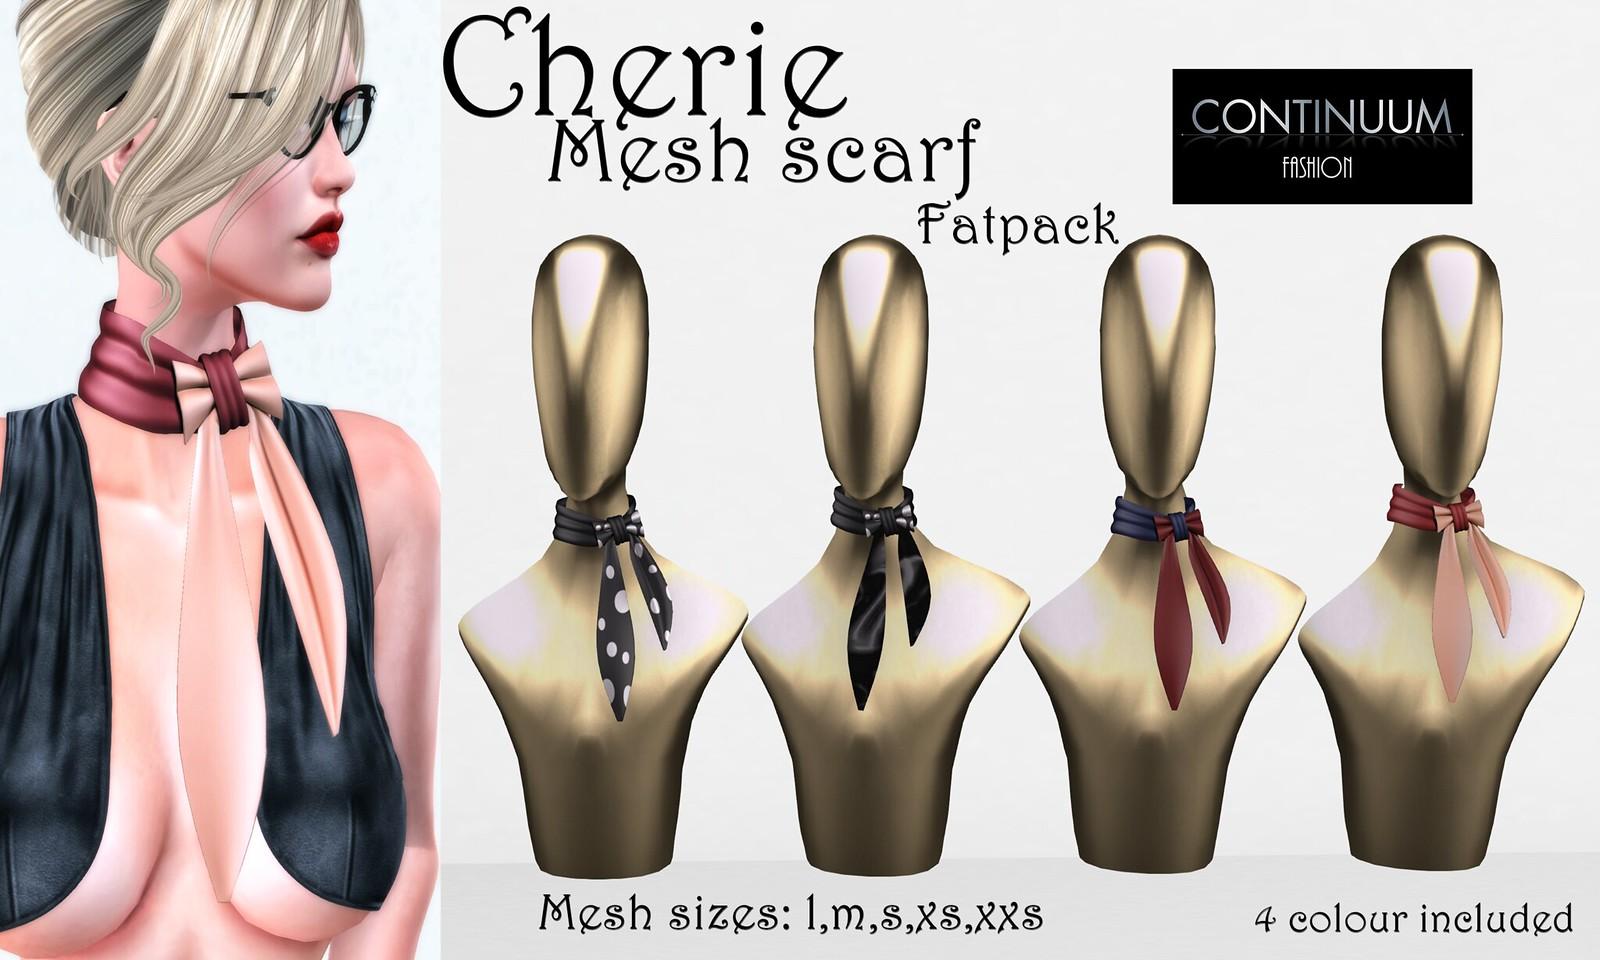 Continuum Fashion Cherie scarf